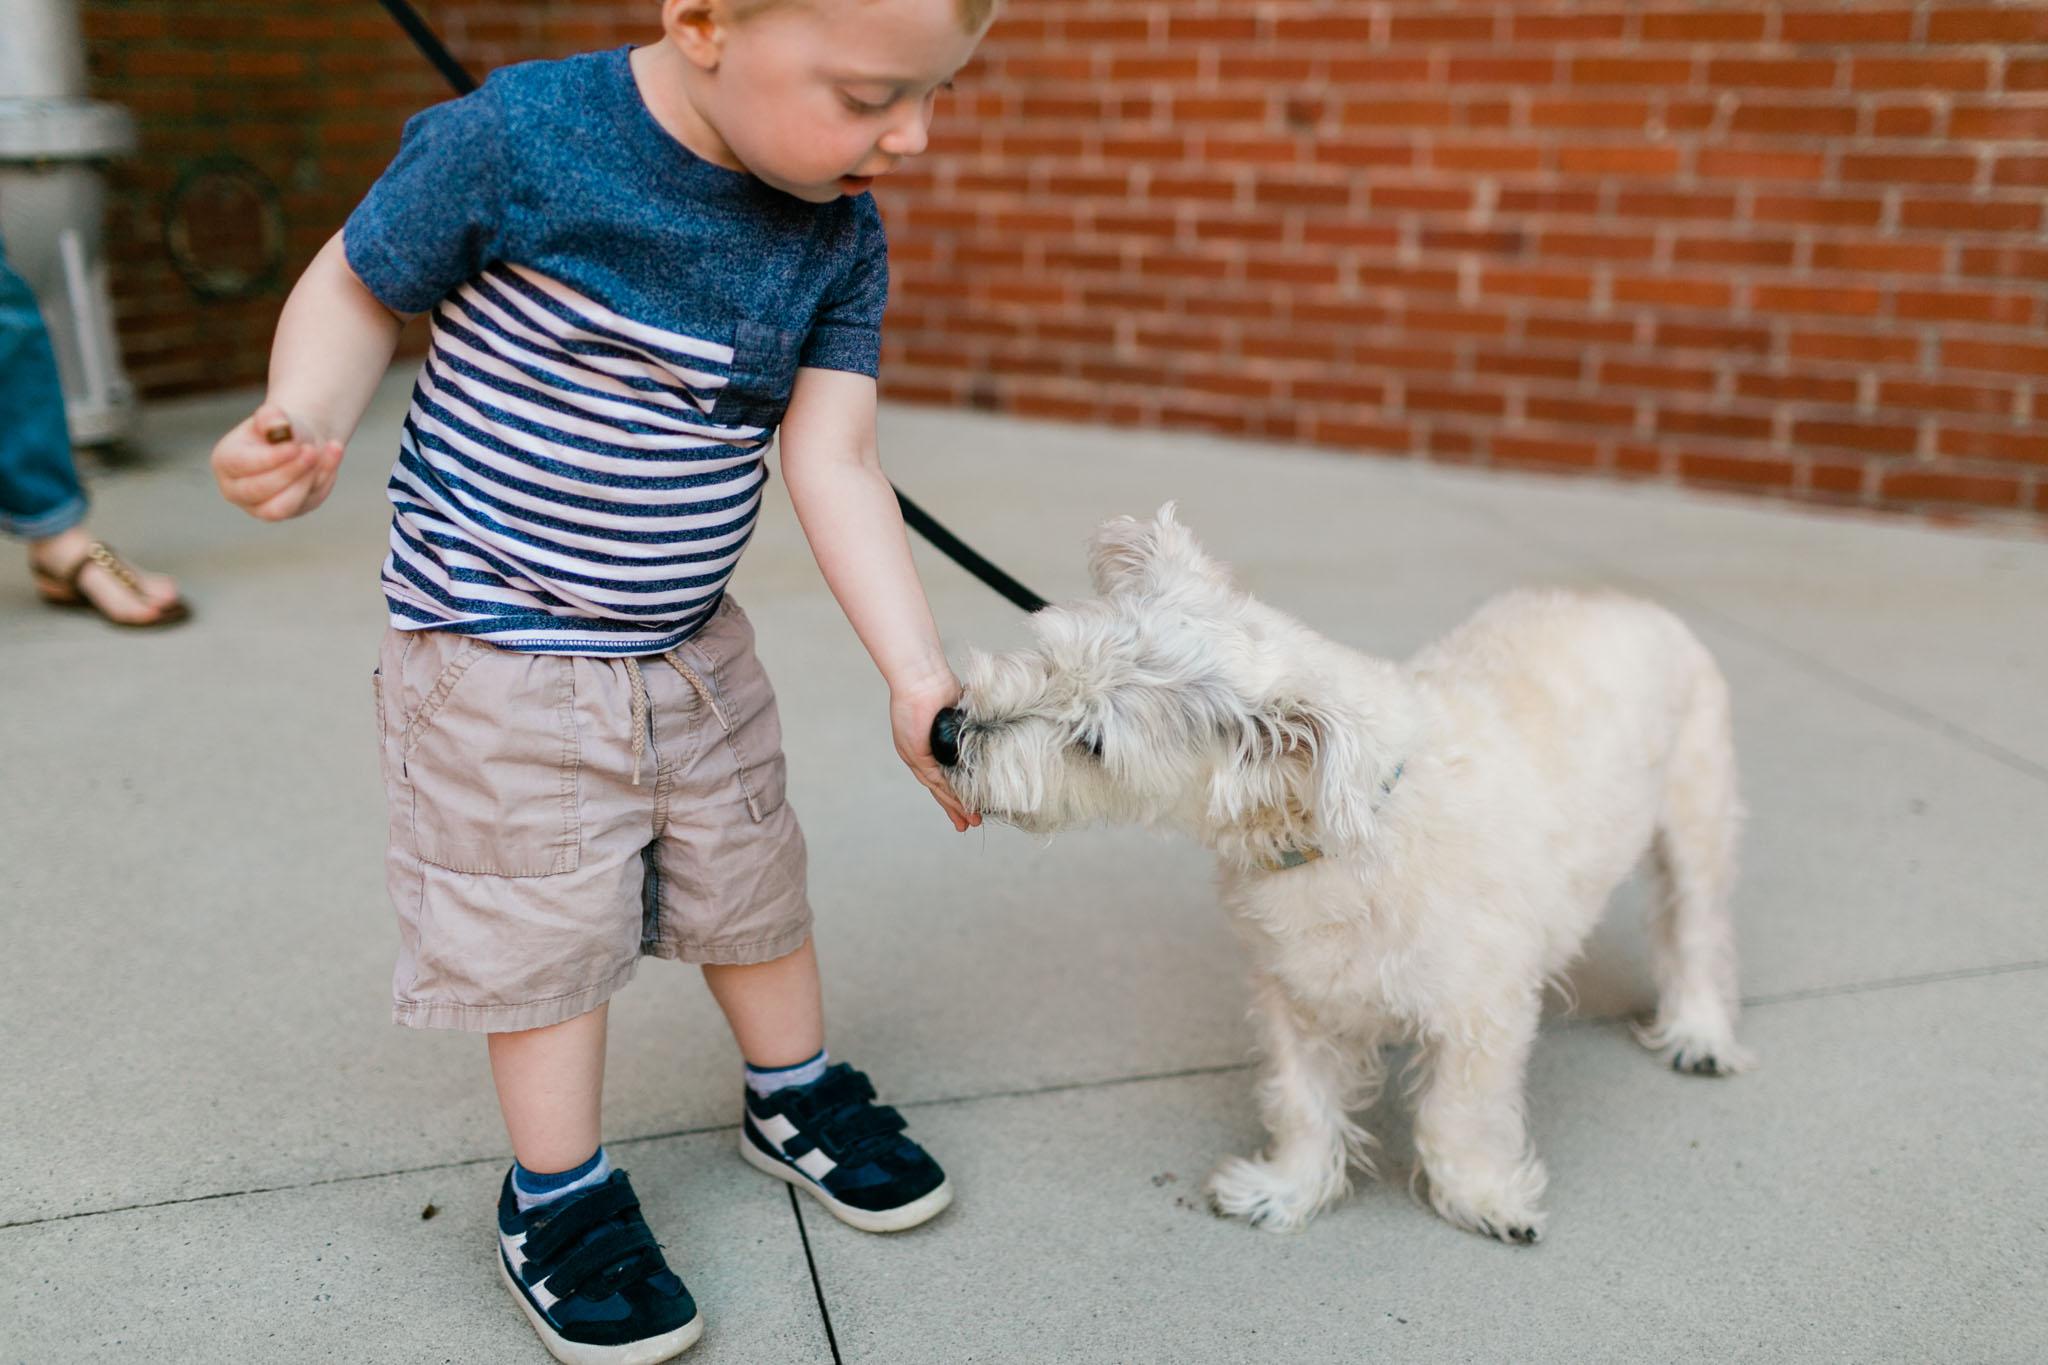 Boy feeding dog | Durham Photographer | By G. Lin Photography